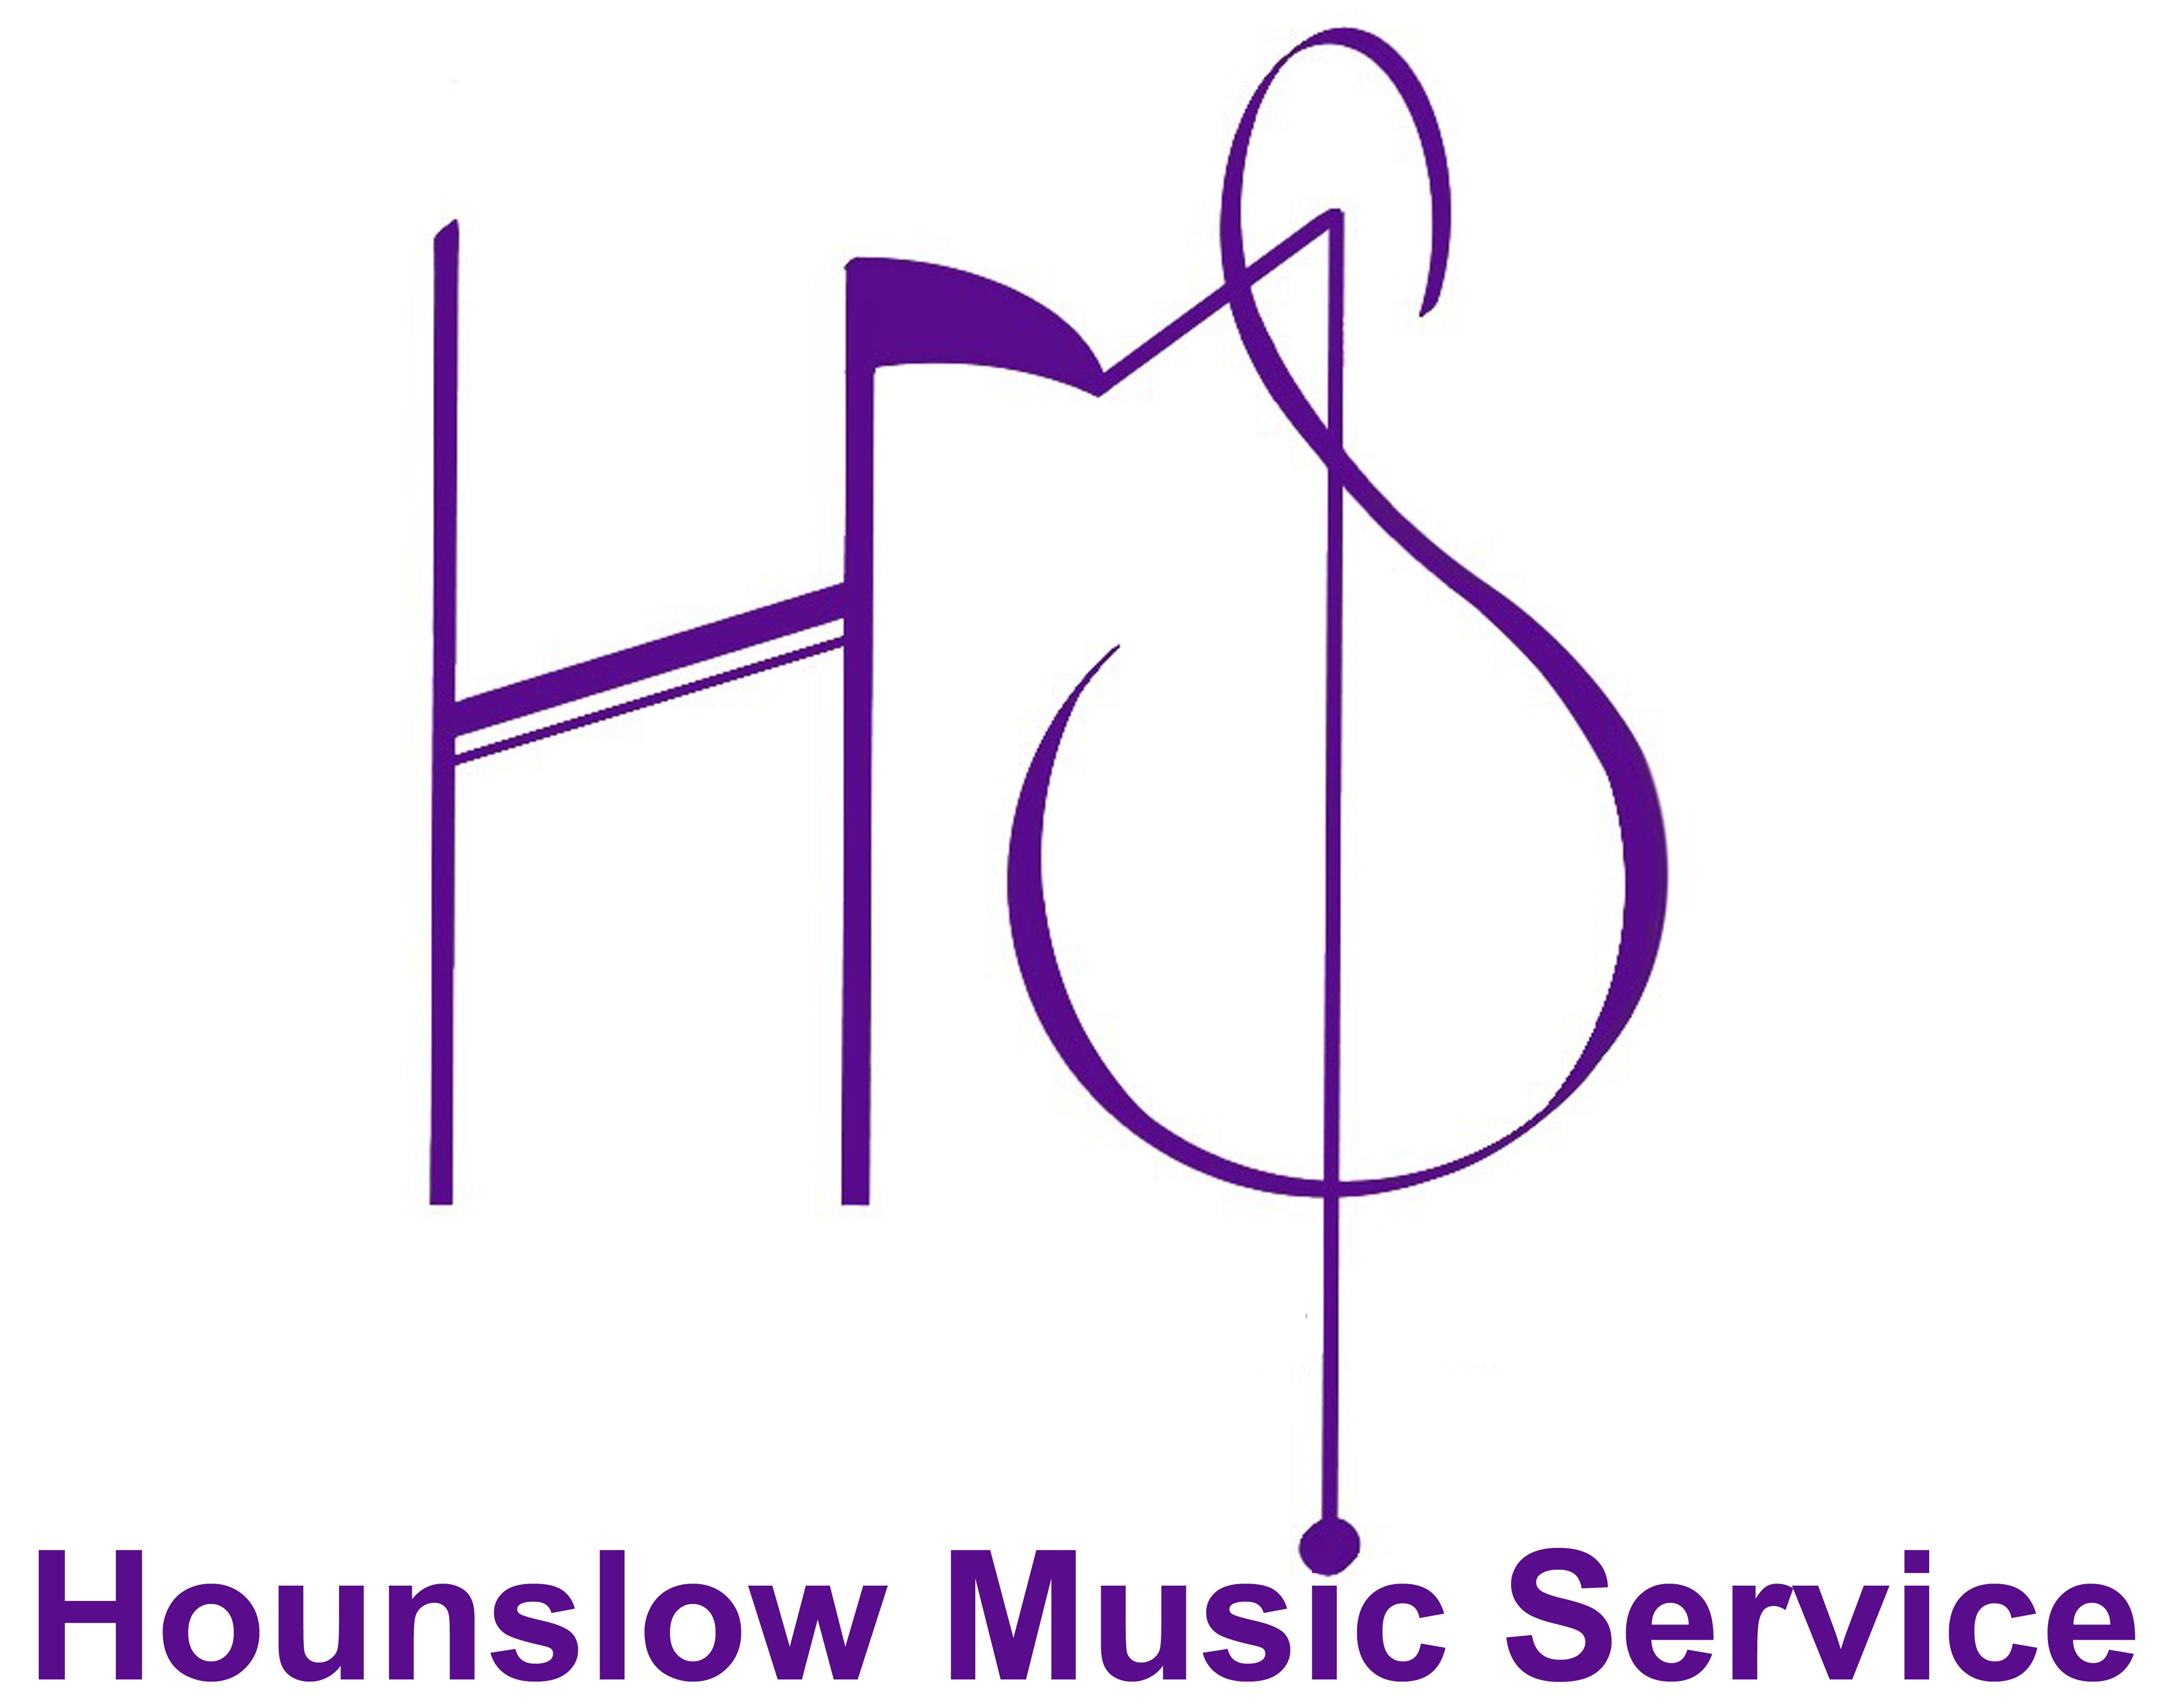 Hounslow Music Service